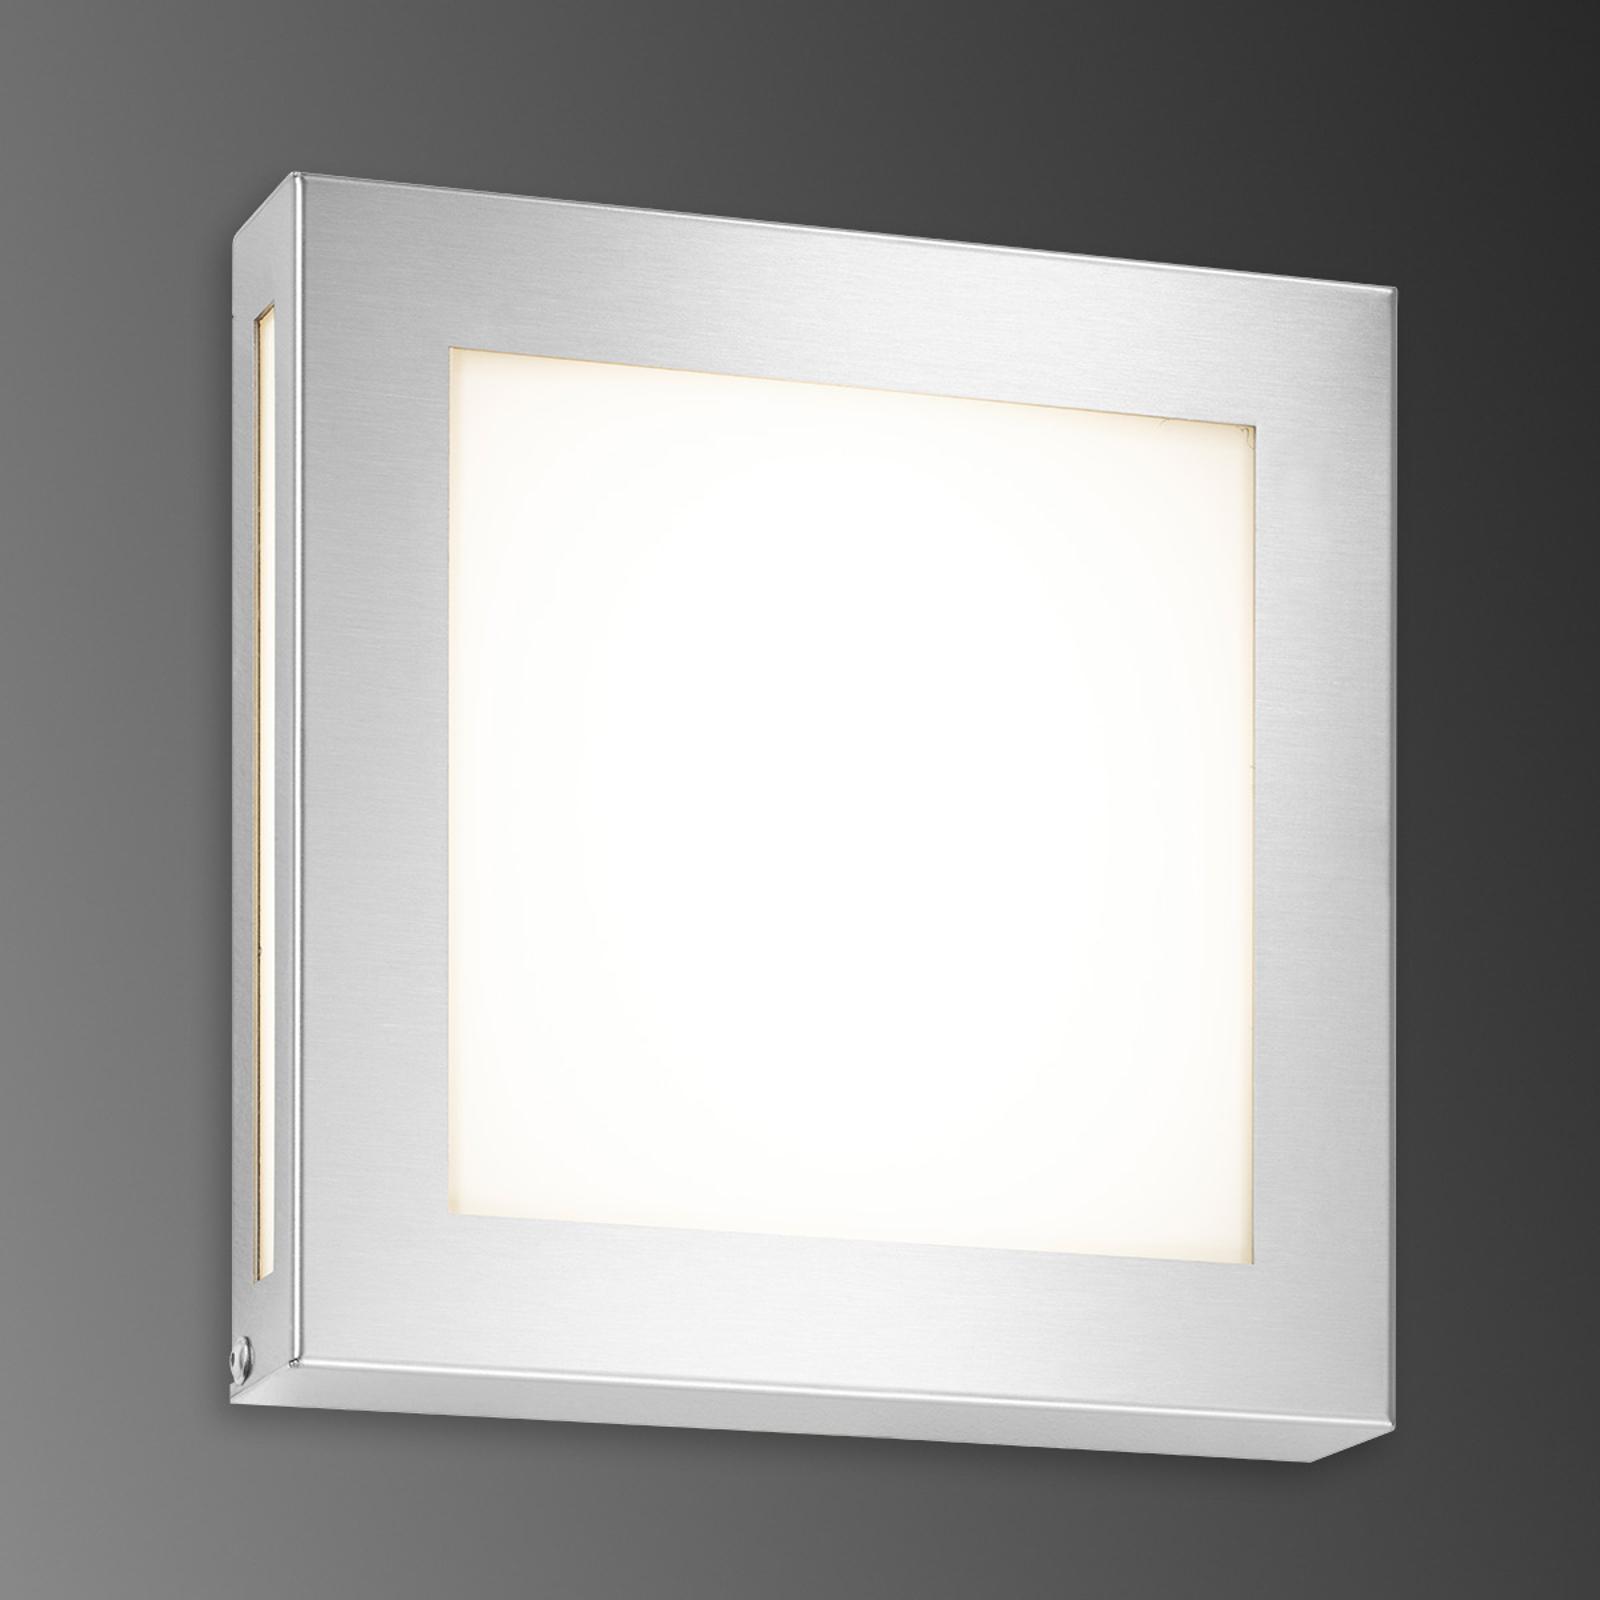 LED-Außenwandleuchte Aqua Legendo Mini, edelstahl